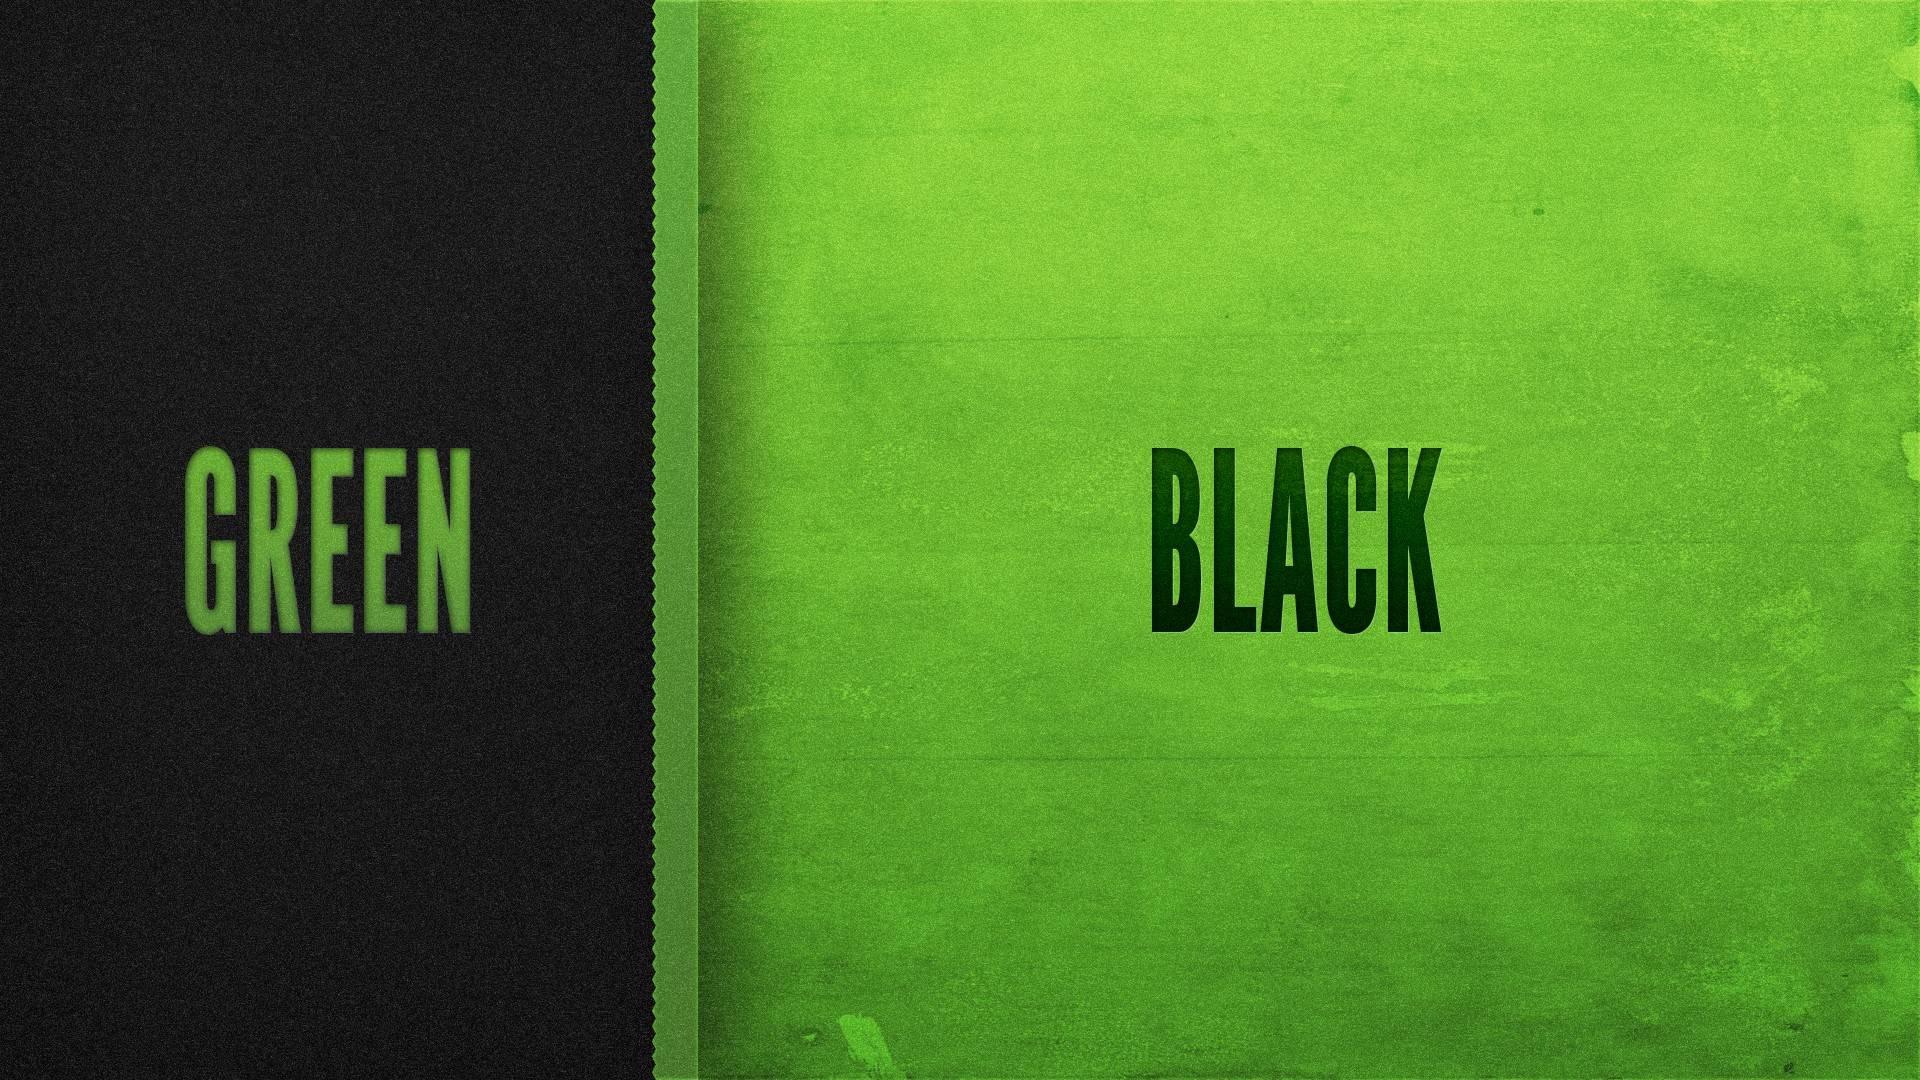 Green Black 19201080 Wallpaper 2357984 1920x1080